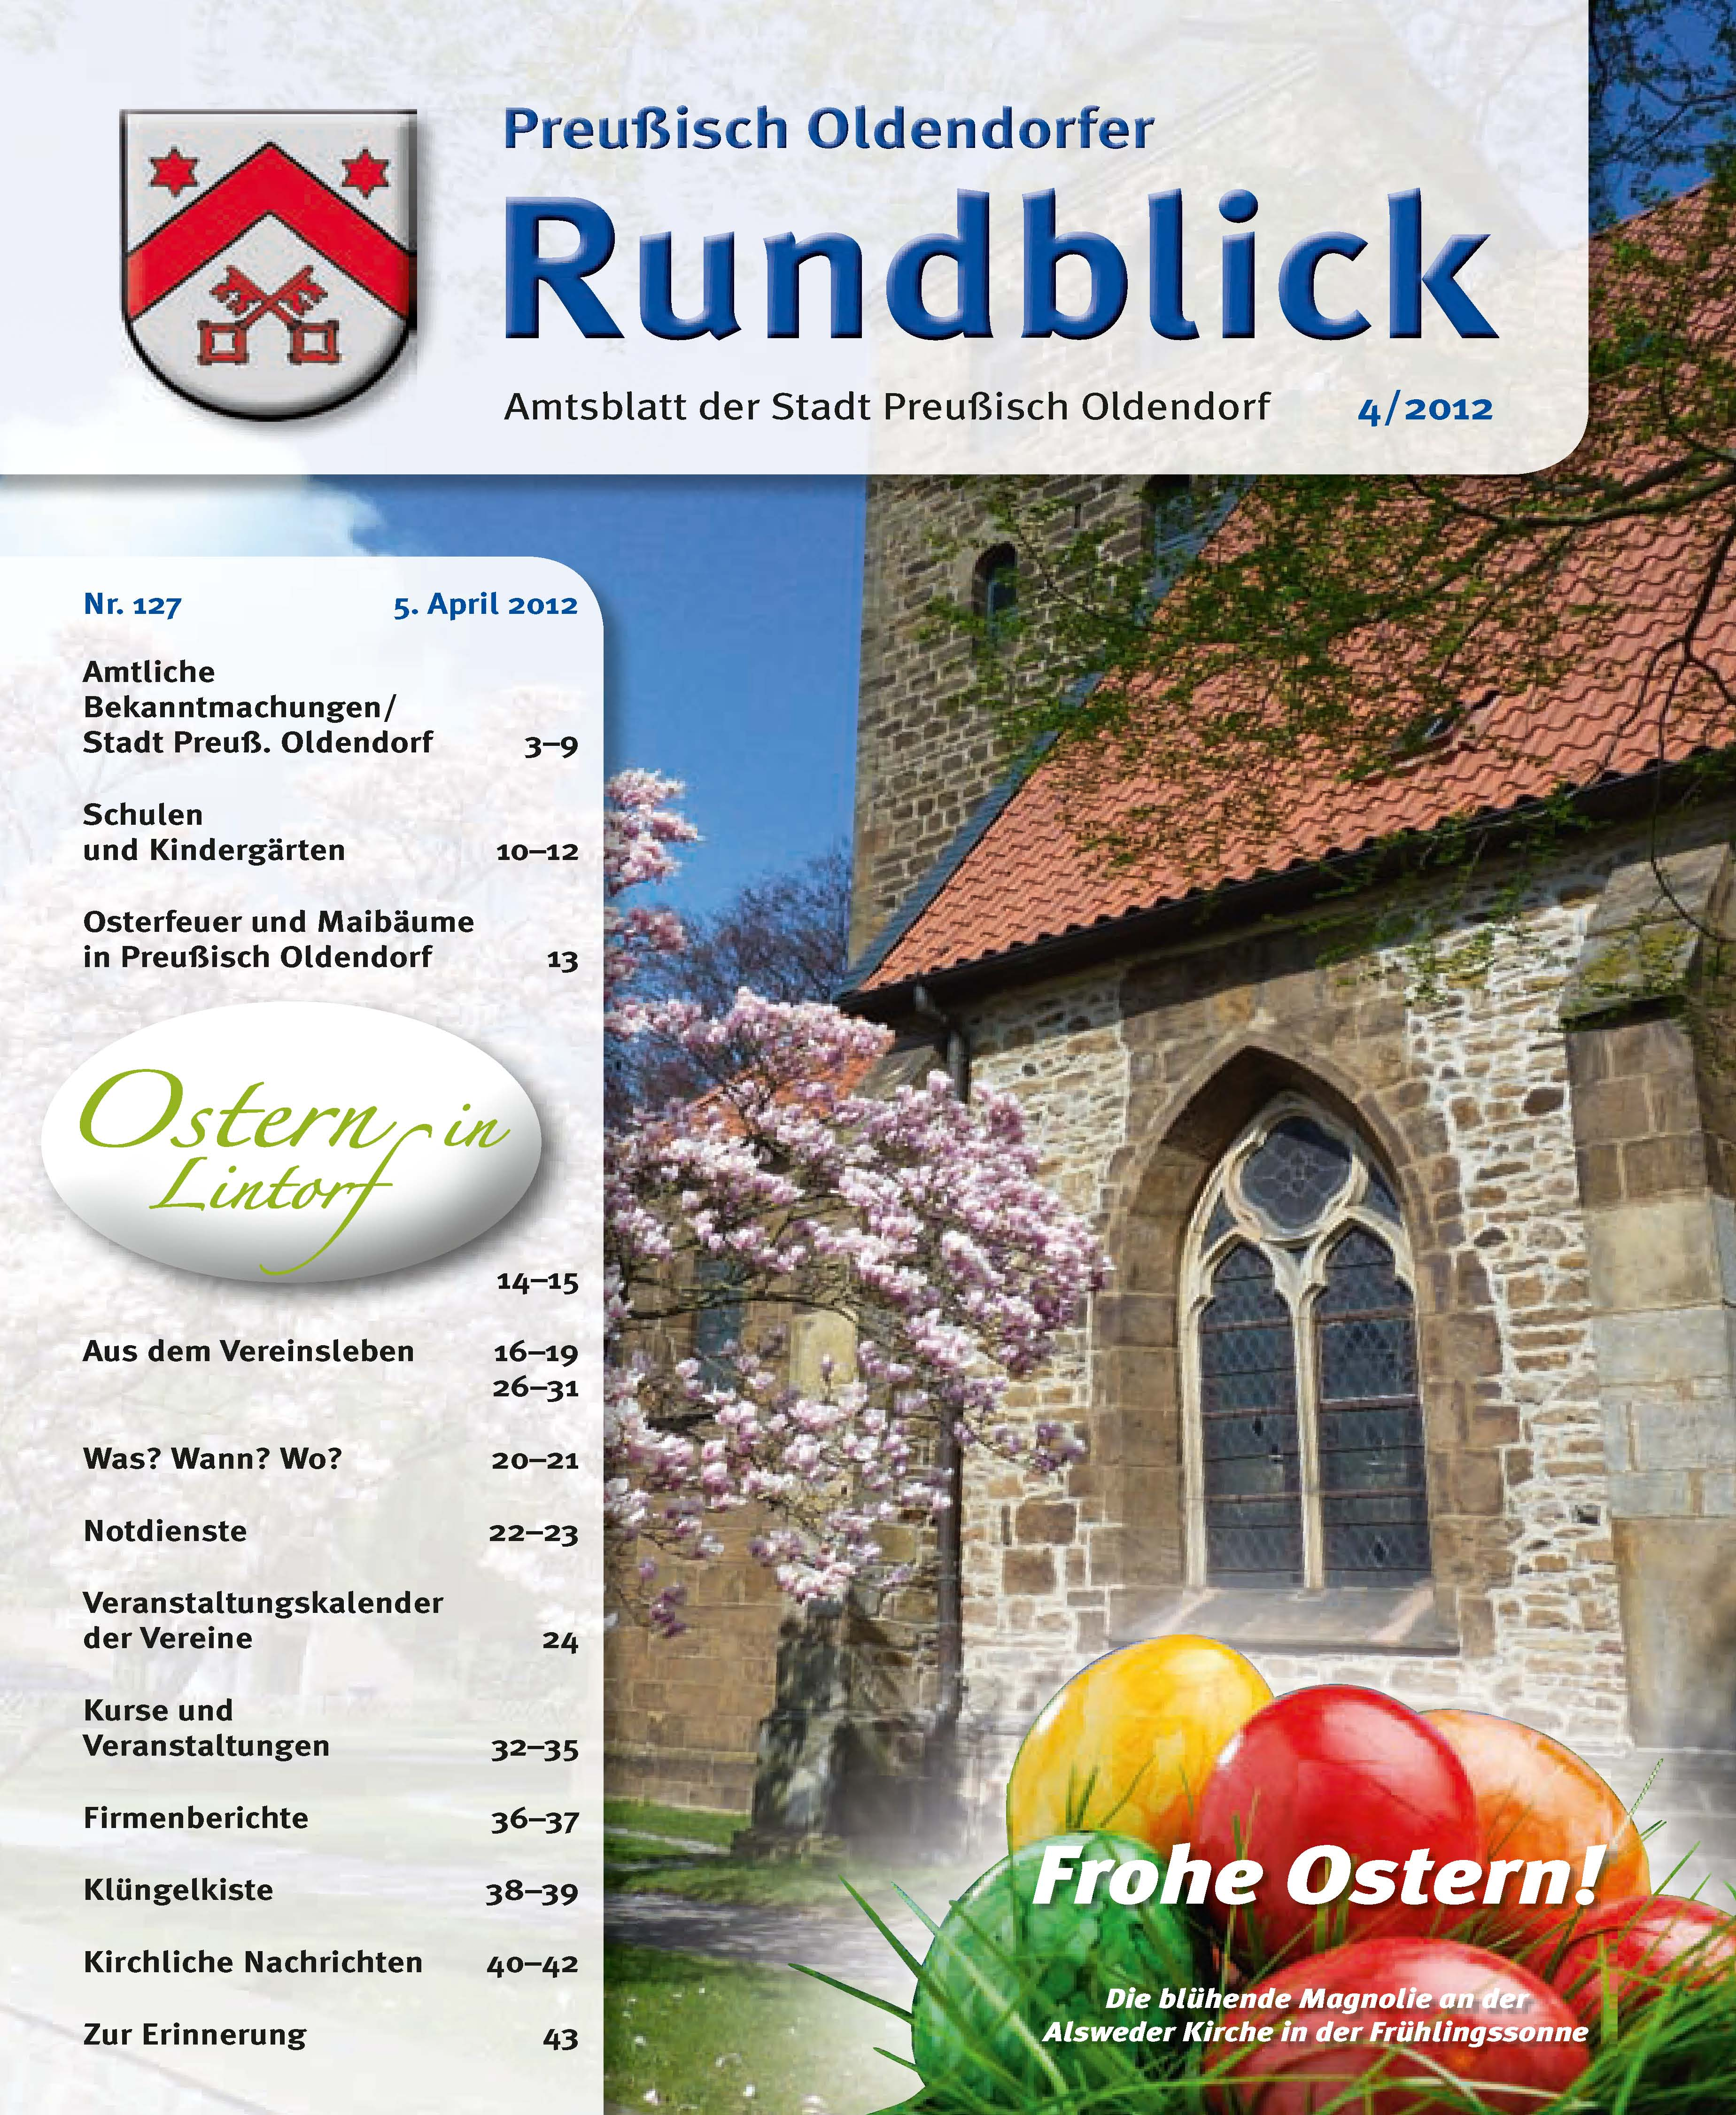 Stadt Preußisch Oldendorf